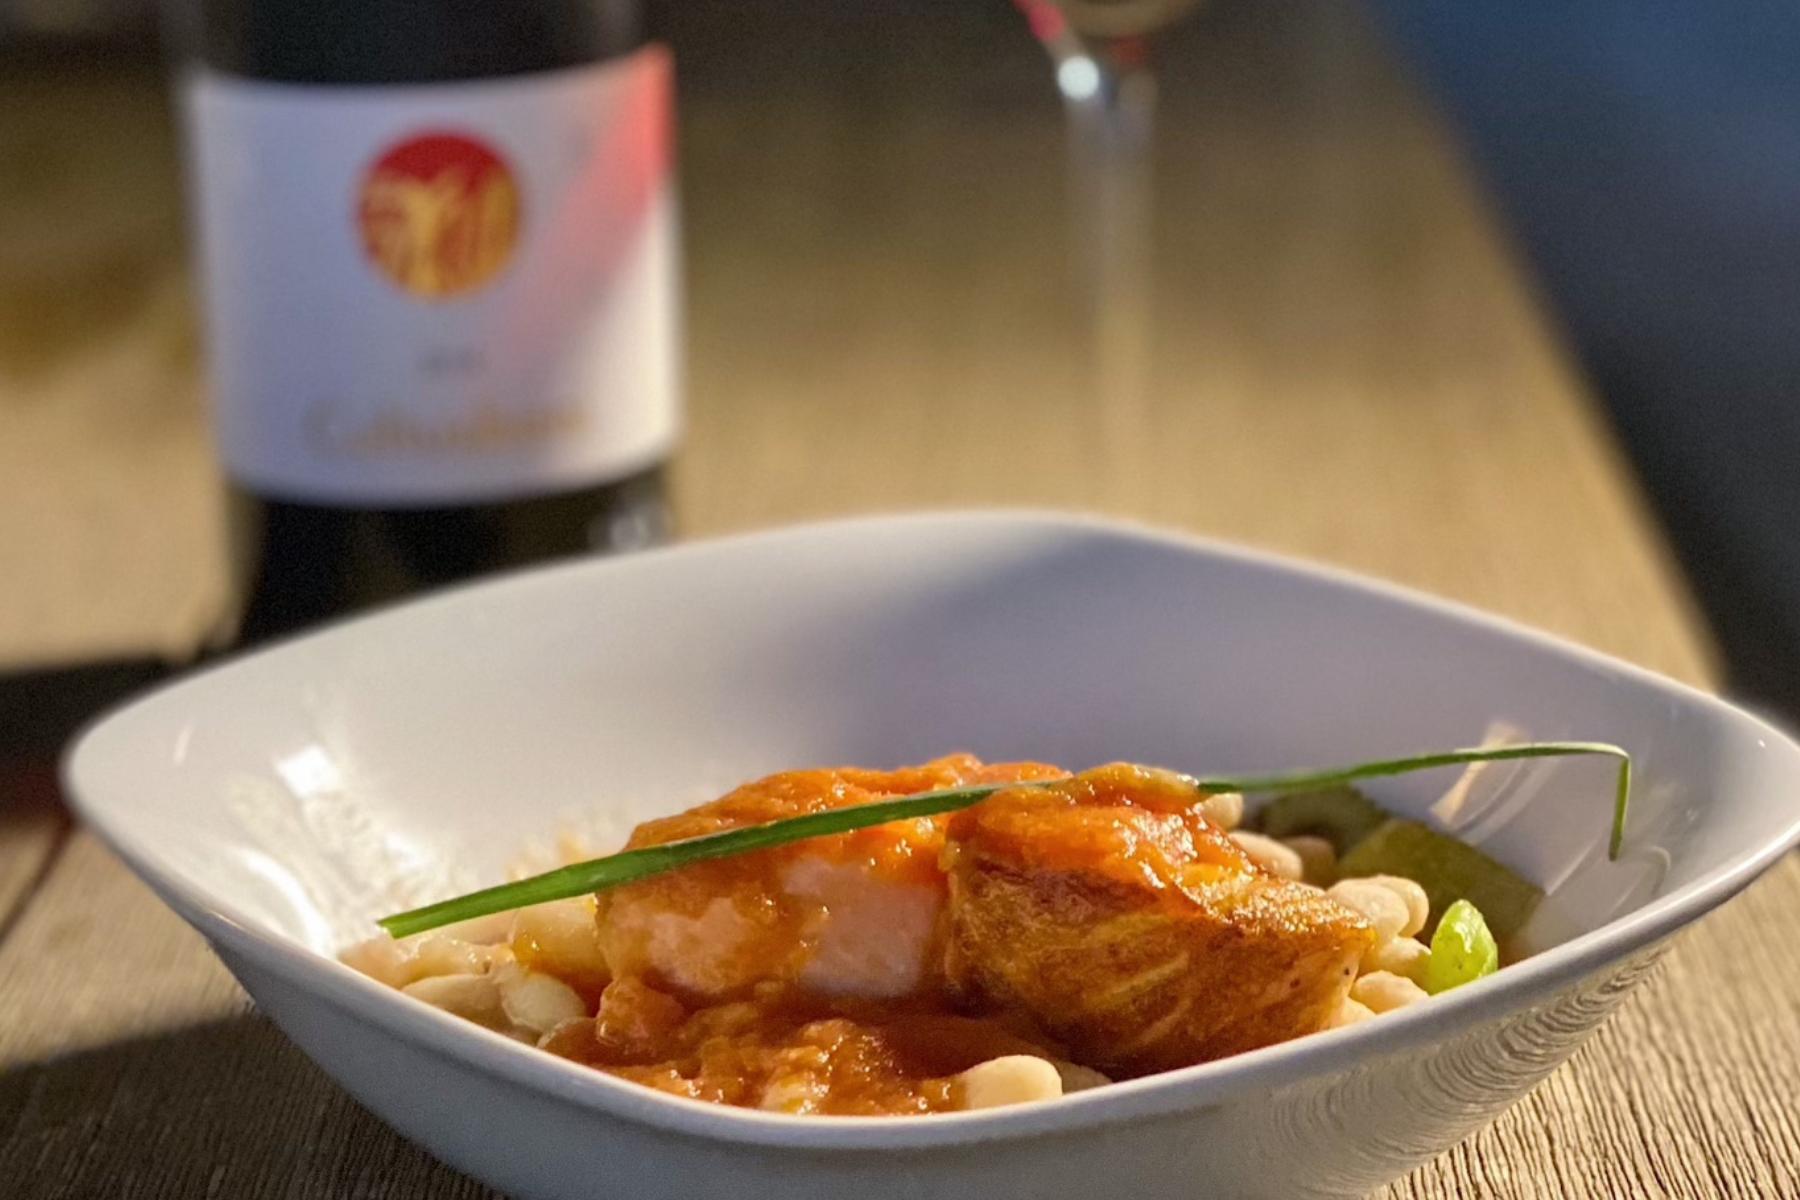 That's Amore: Italian Food & Wine Pairings